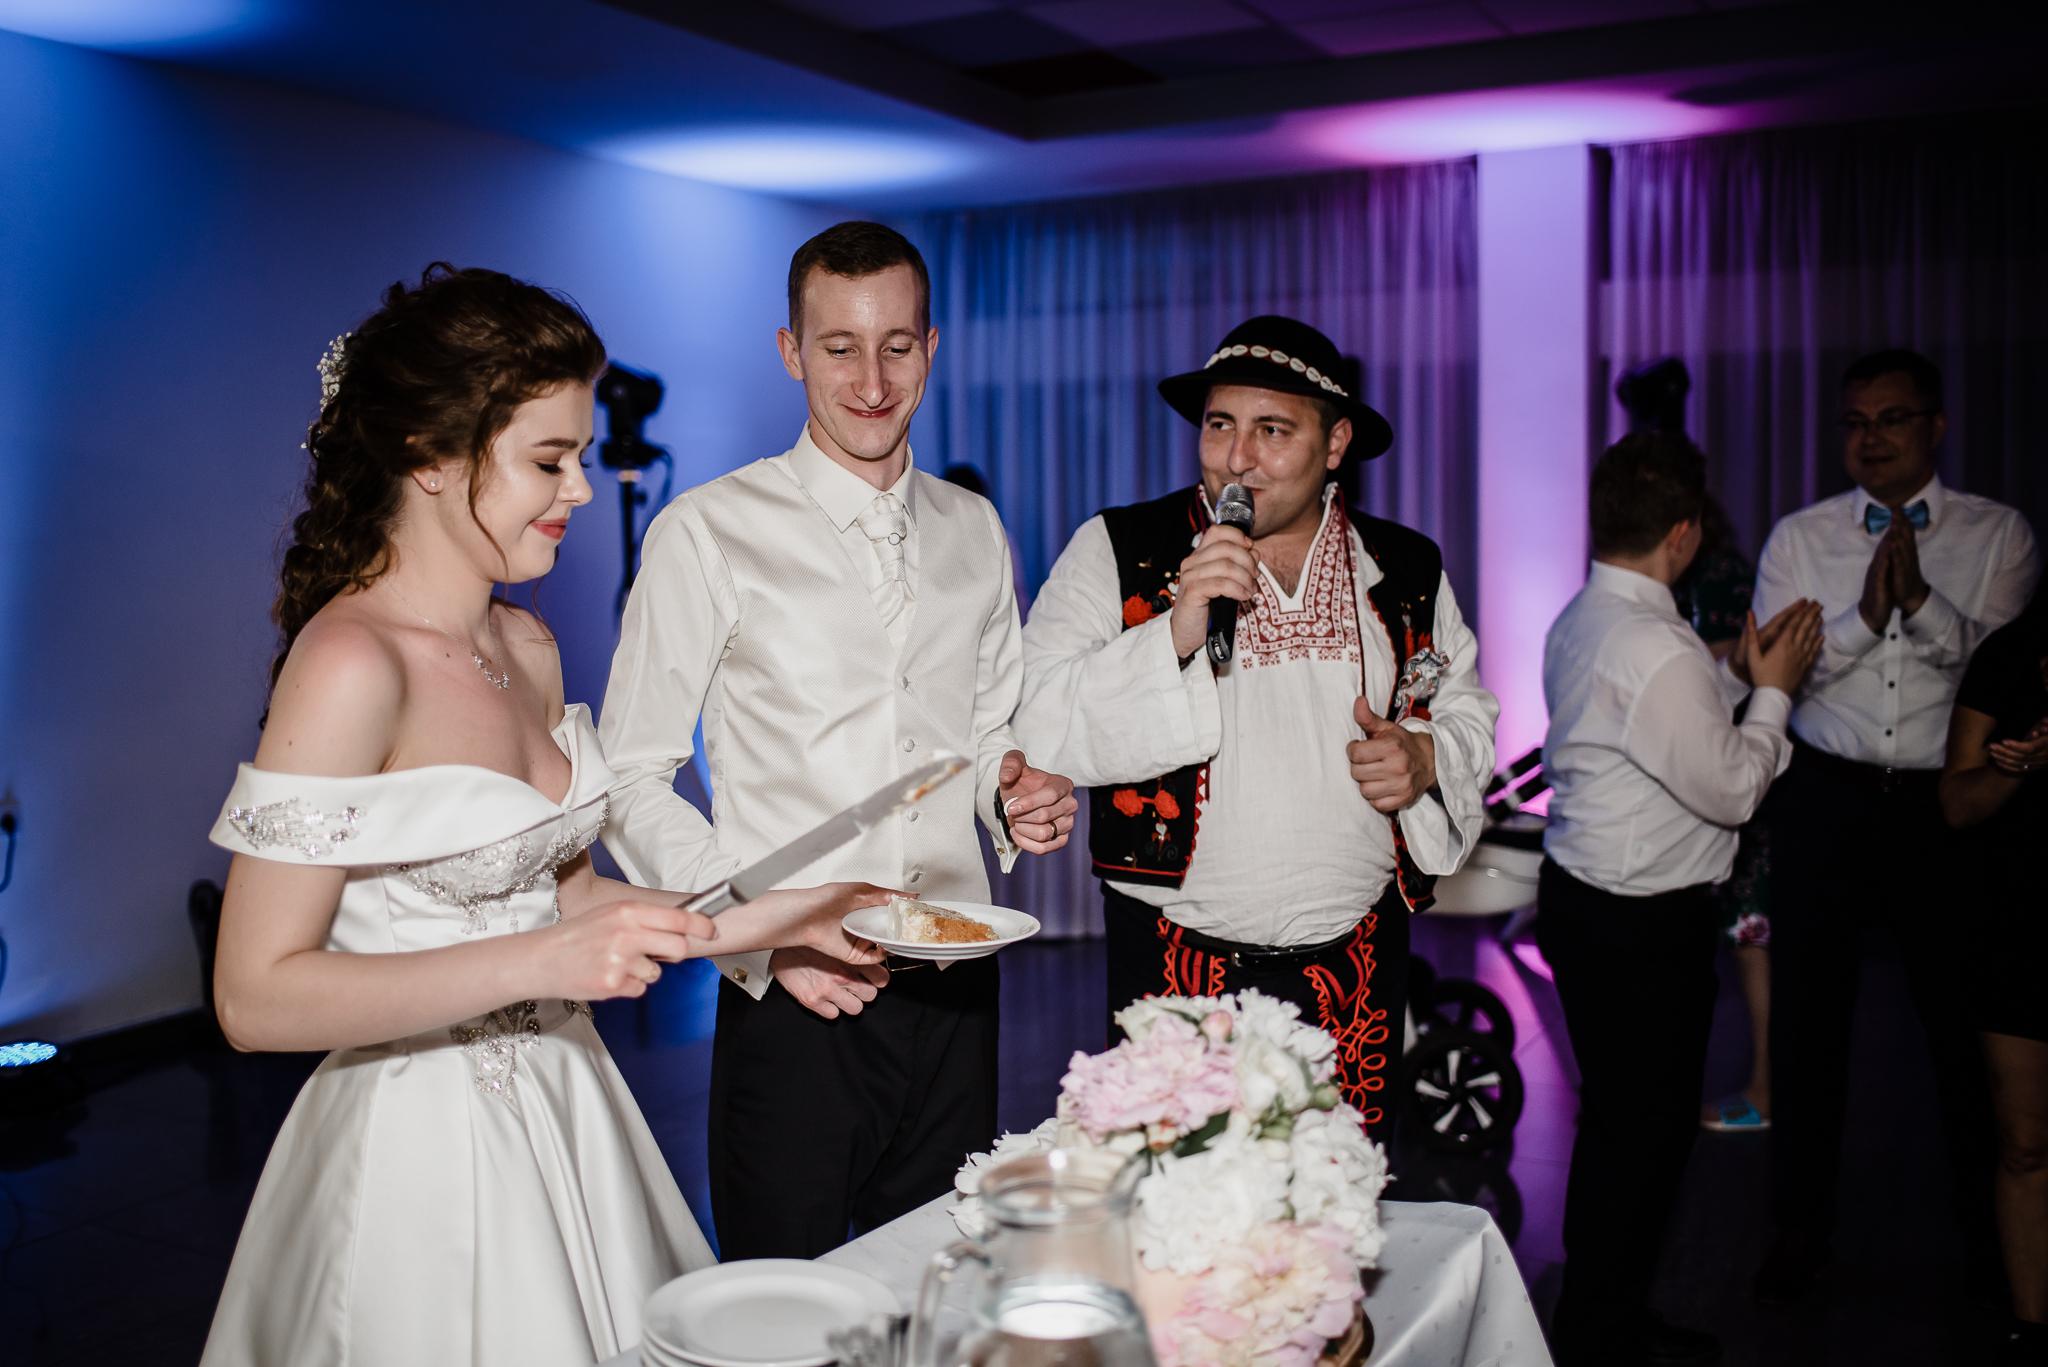 Svadba Pata, Kulturák u Palušáka 02 #svadobnyDJ, #djanasvadbu, #svadba, #svadbapata, #Pata #DJAnavi